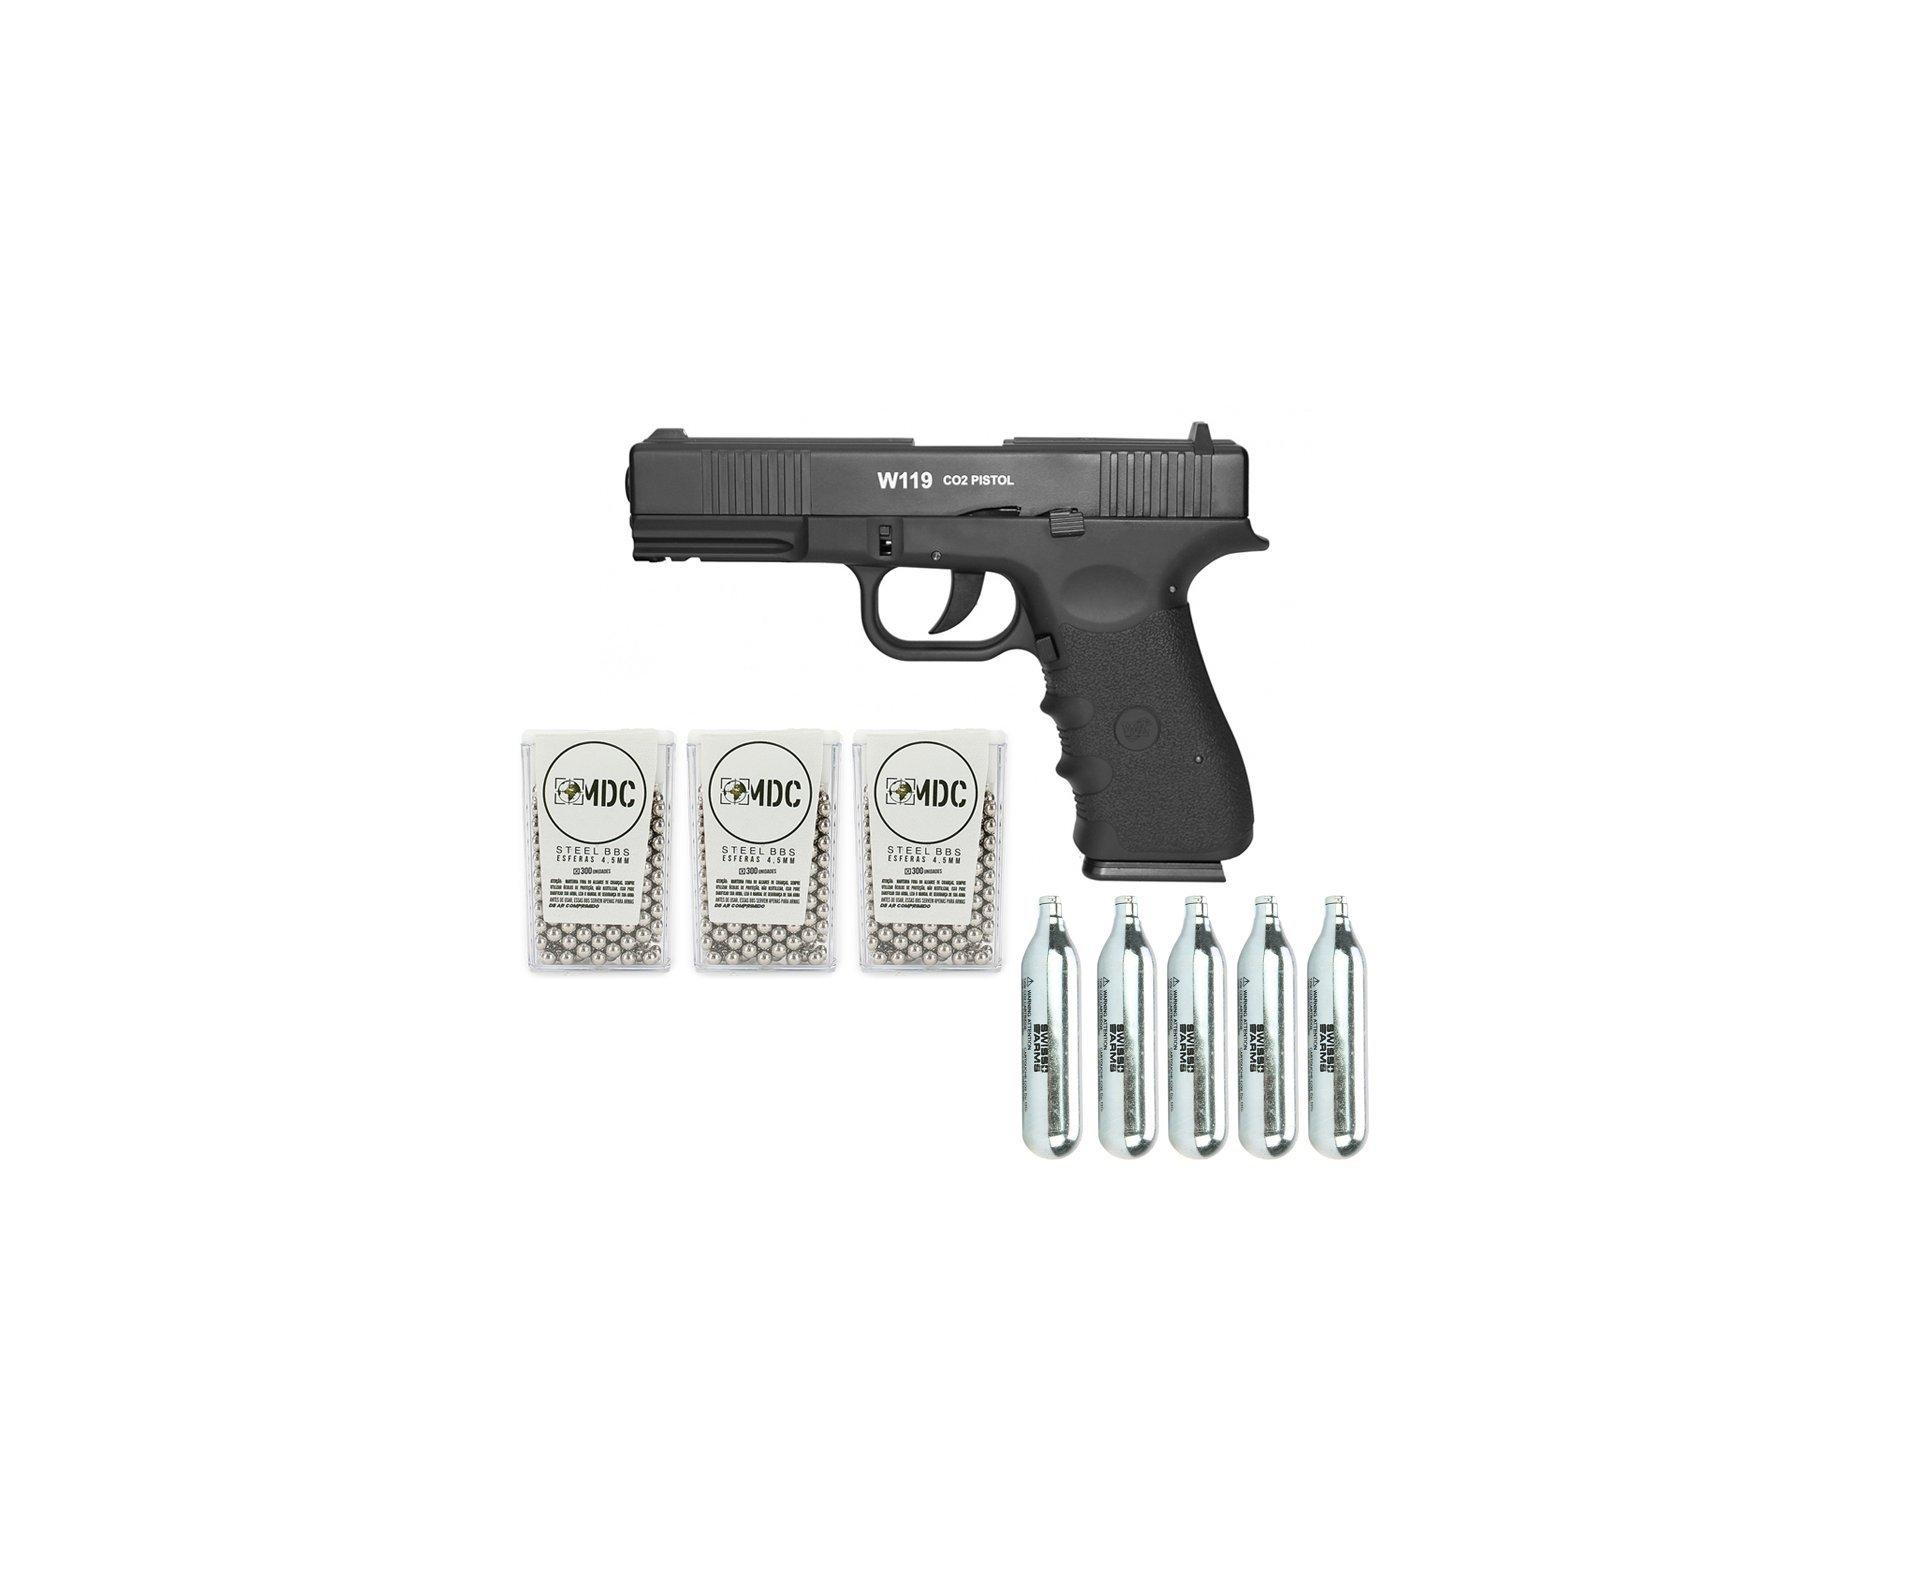 Pistola De Pressão Gas Co2 Wg Glock W119 Slide Metal Blowback 4,5mm + 05 Cilindro Co2 + 900 Esferas Aço